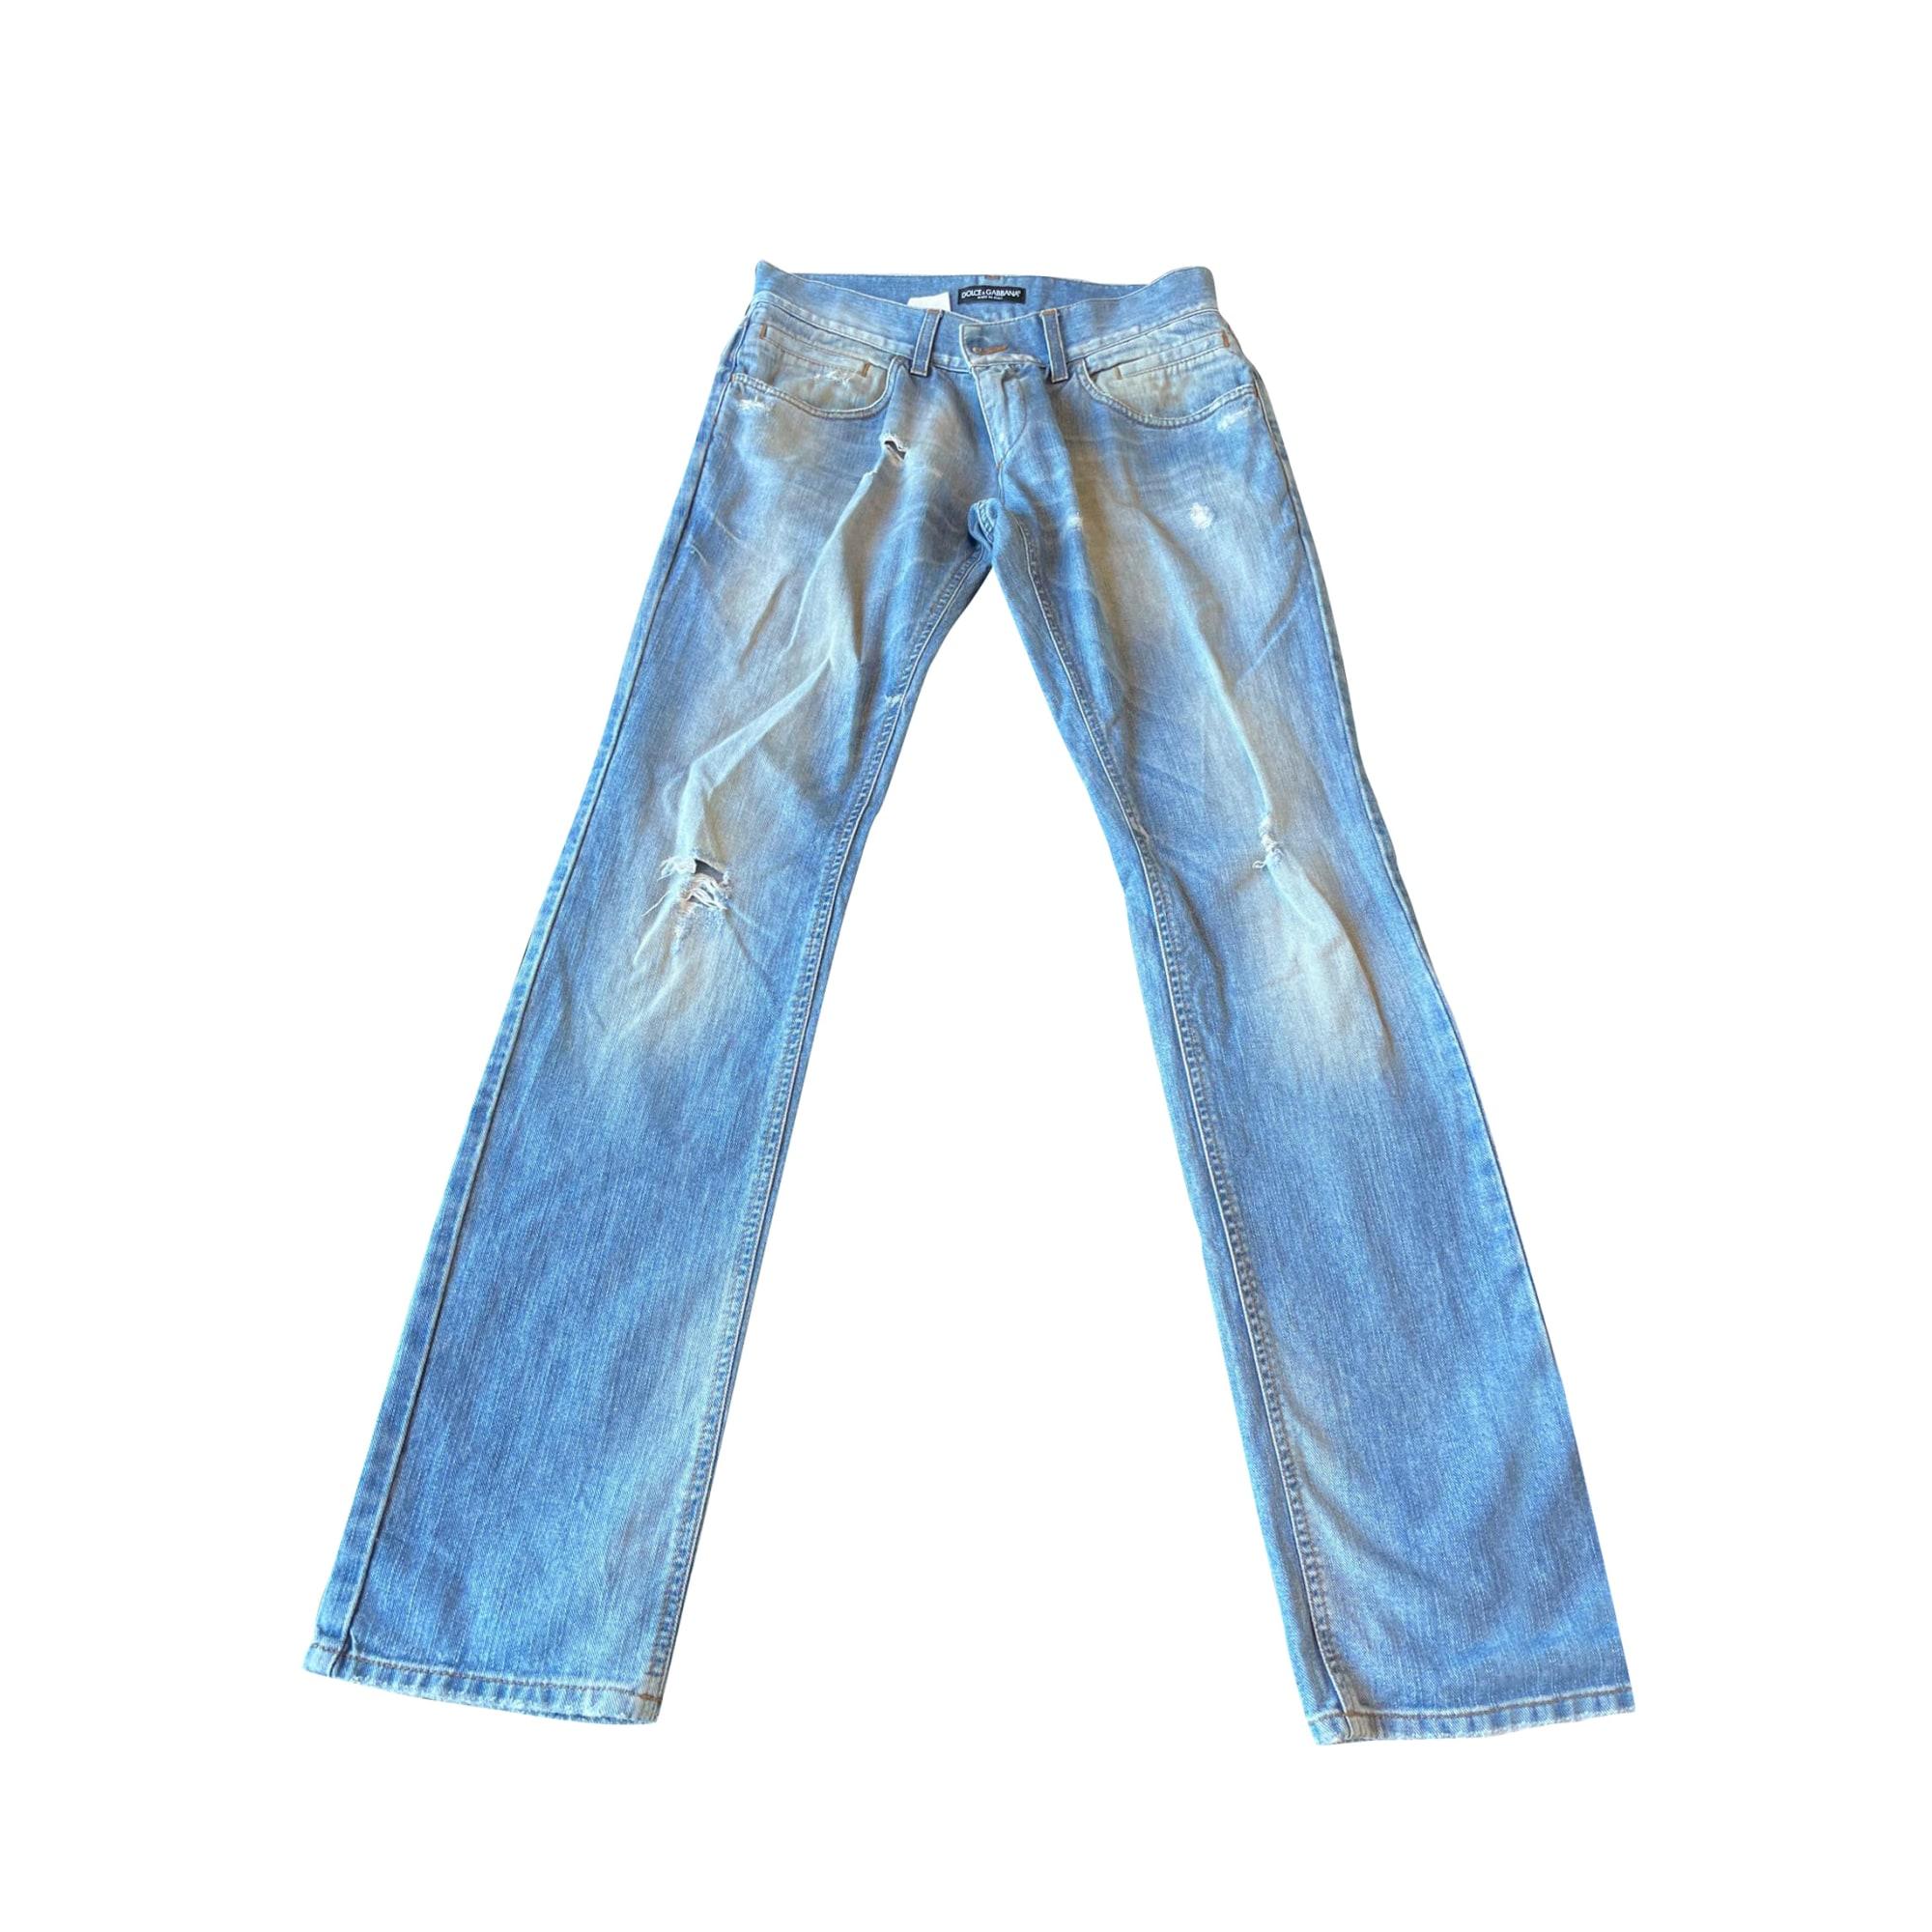 Straight Leg Jeans DOLCE & GABBANA Blue, navy, turquoise